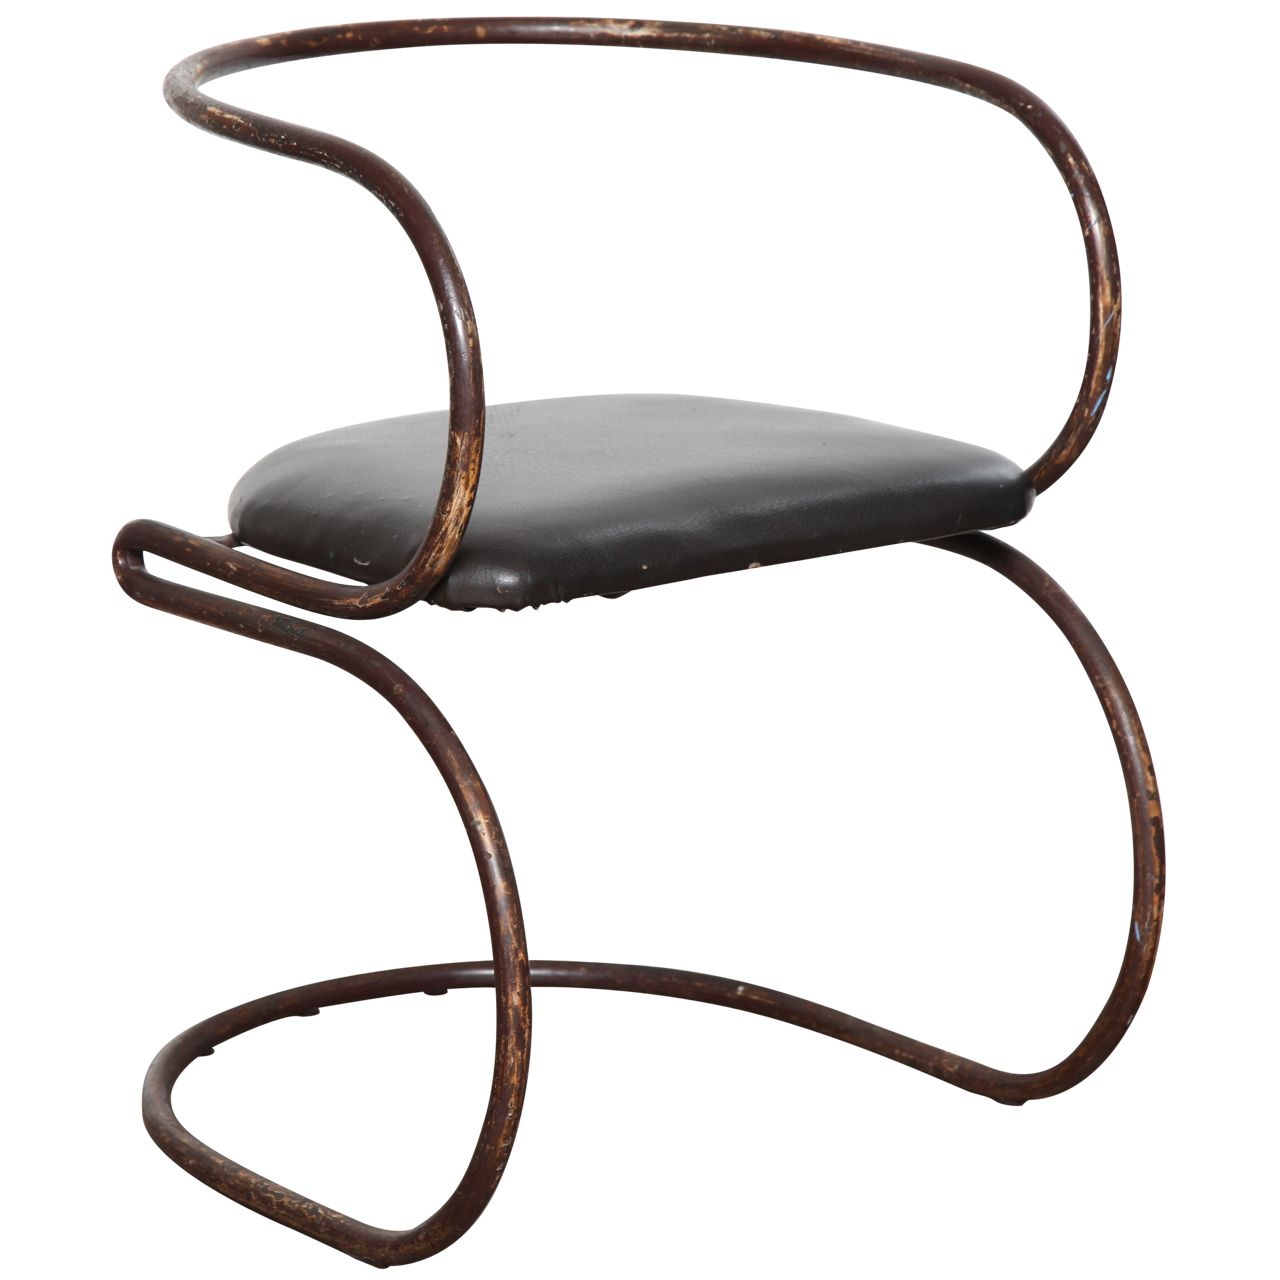 Nathan Horwitt Chair Sillones El Viento Y Iluminaci N # Muebles Tubulares Beta